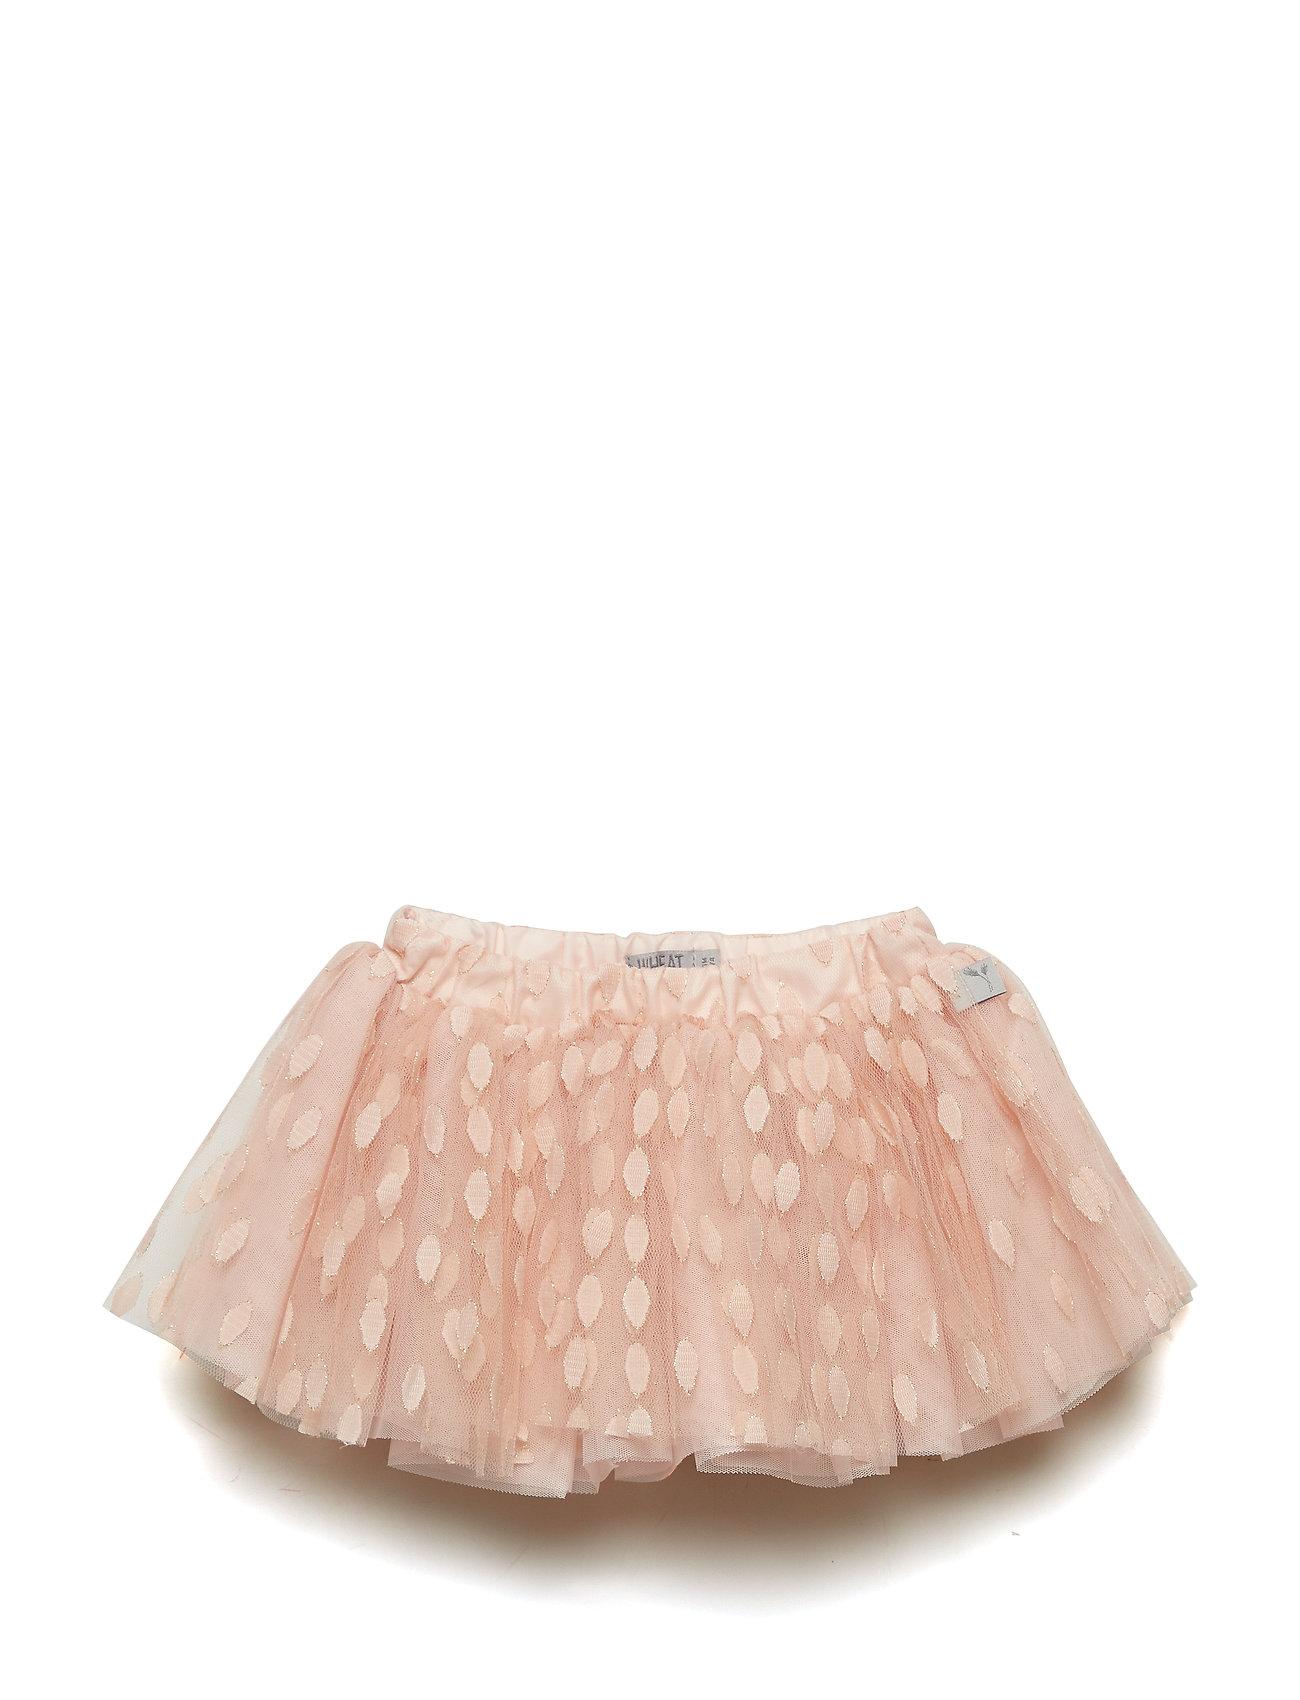 23369200 Skirt Manola (Powder) (349 kr) - Wheat - | Boozt.com